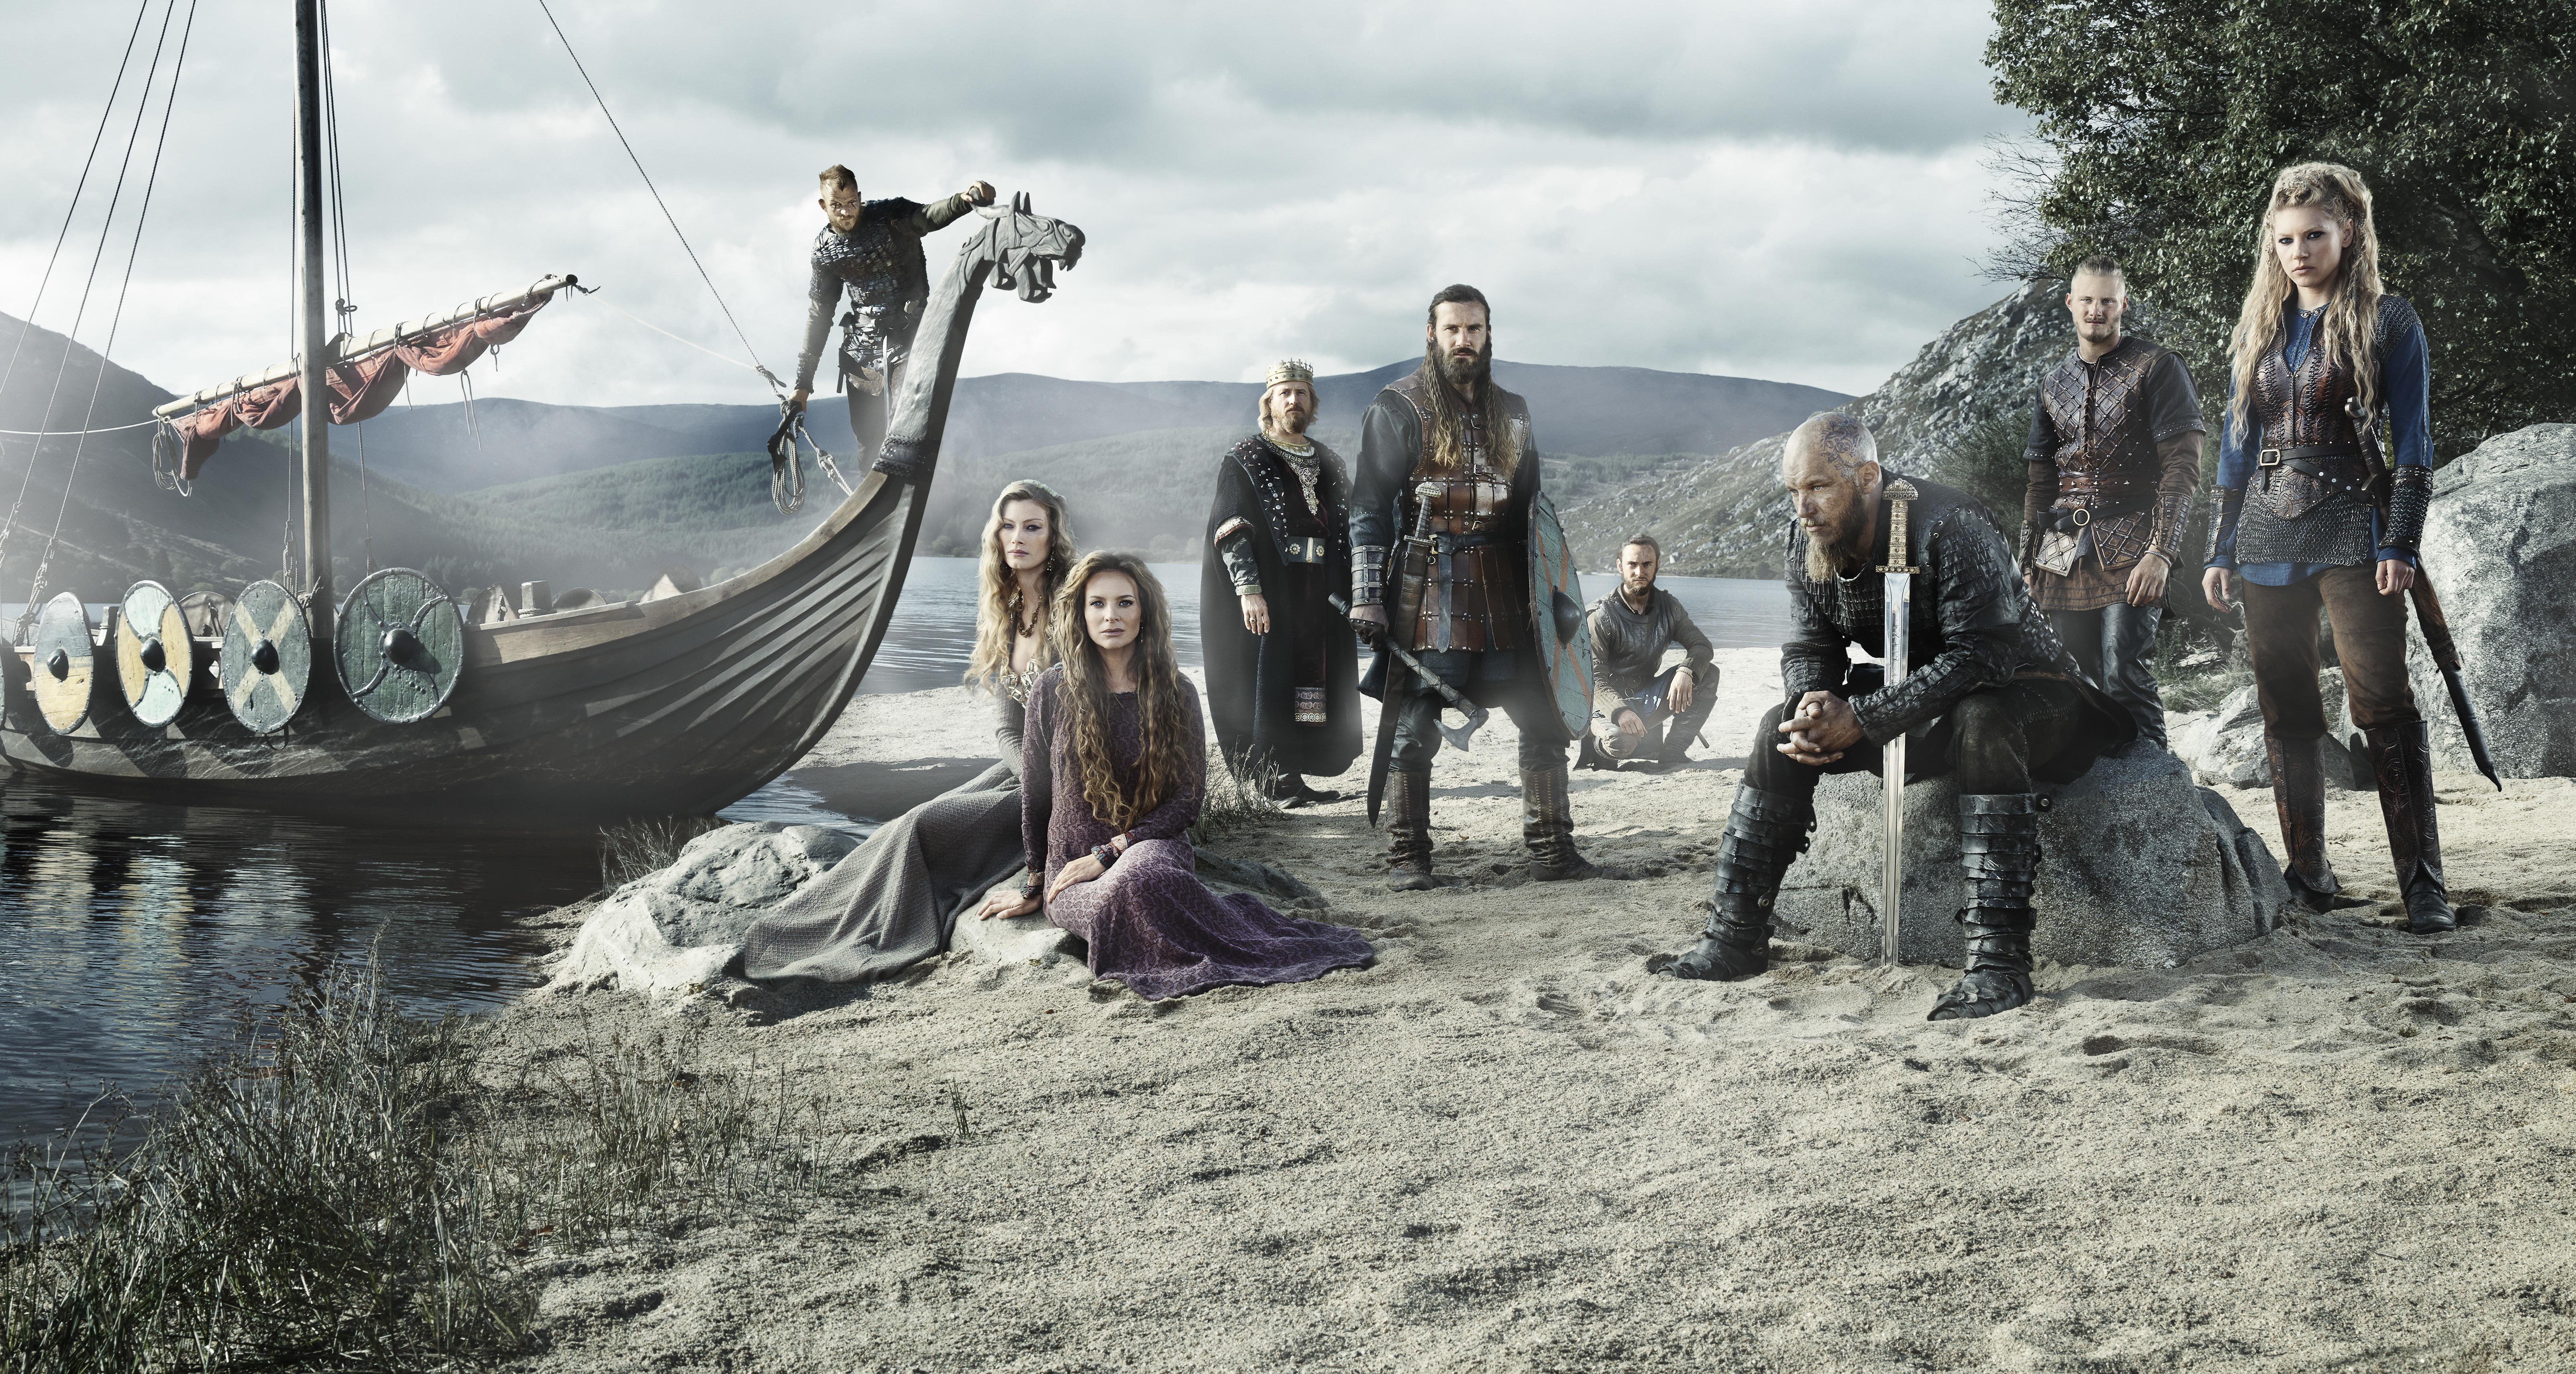 Vikings Wallpapers Top Free Vikings Backgrounds